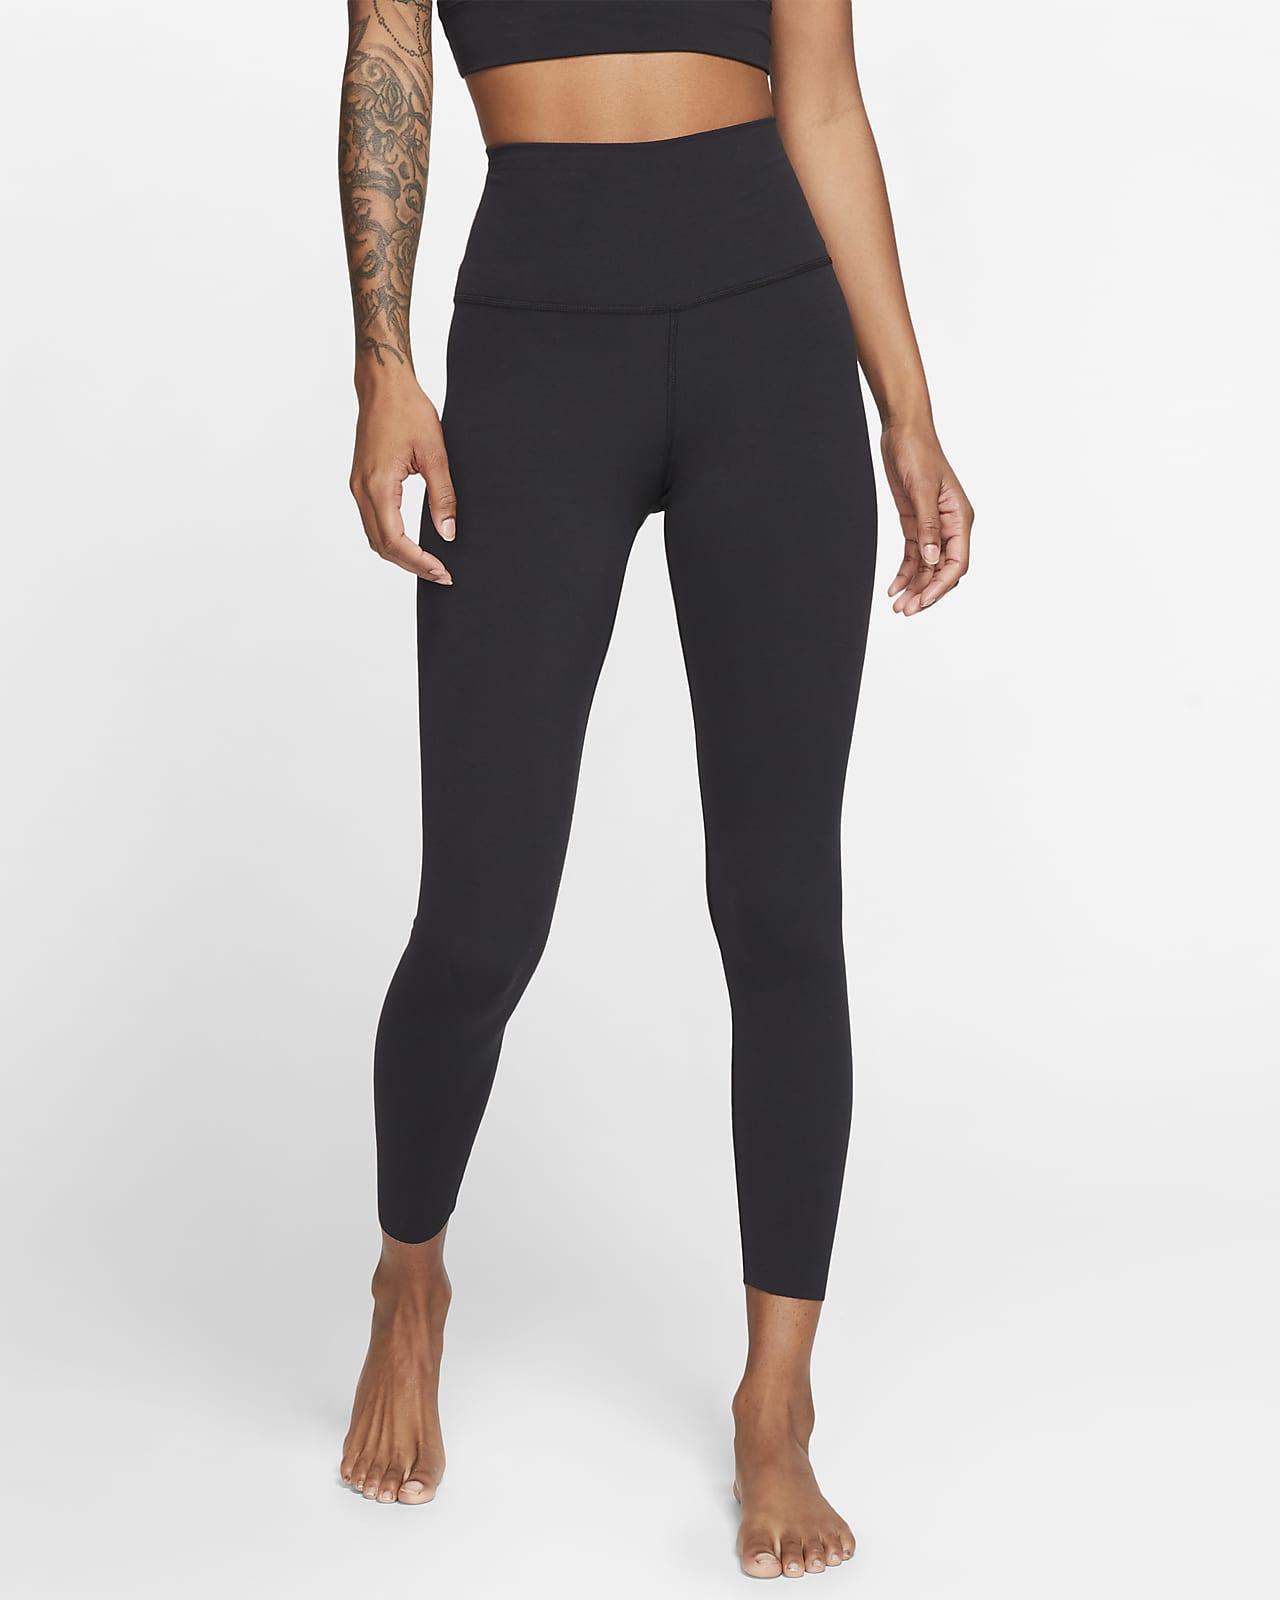 Legging 7/8 Infinalon Nike Yoga Luxe pour Femme